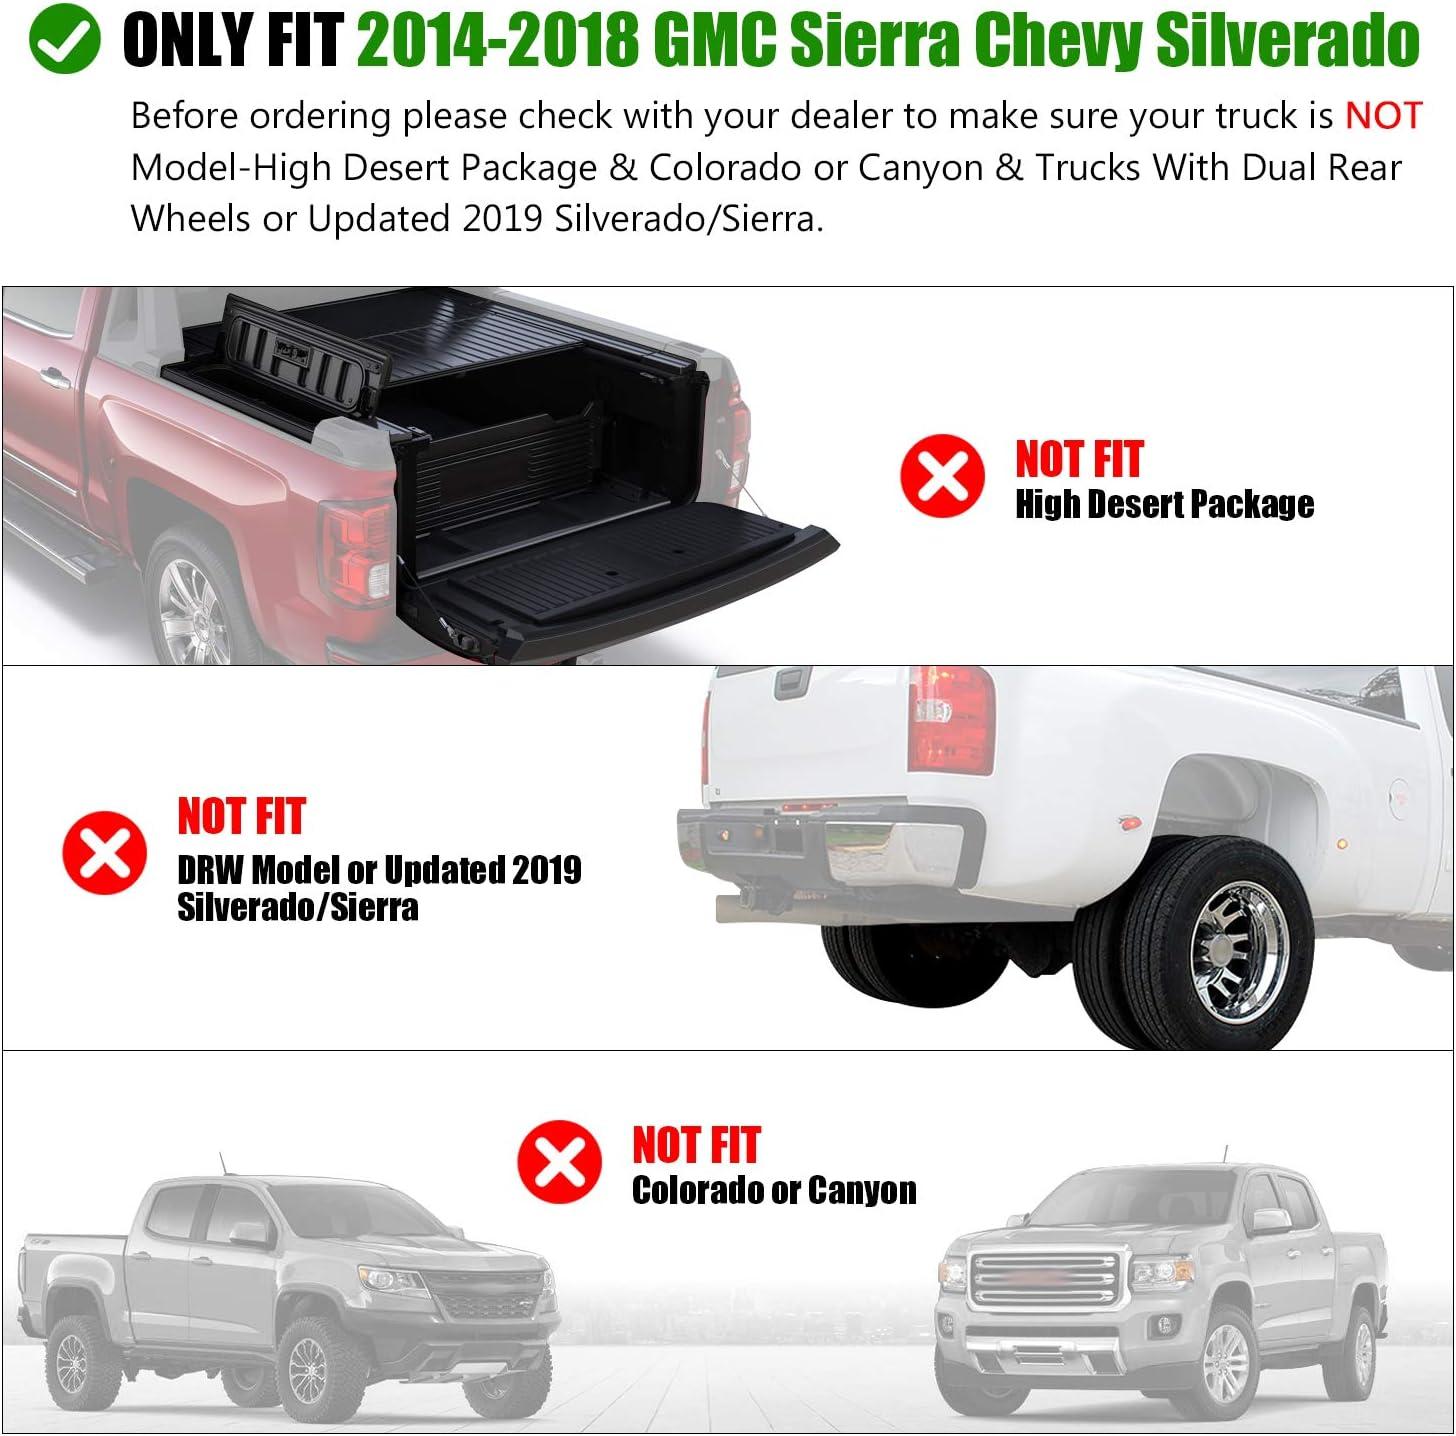 IBACP Fits 2014 2015 2016 2017 2018 GMC Sierra Chevy Silverado Truck Bed Rail Stake Pocket Covers Caps Rail Hole Plugs Odd Shaped